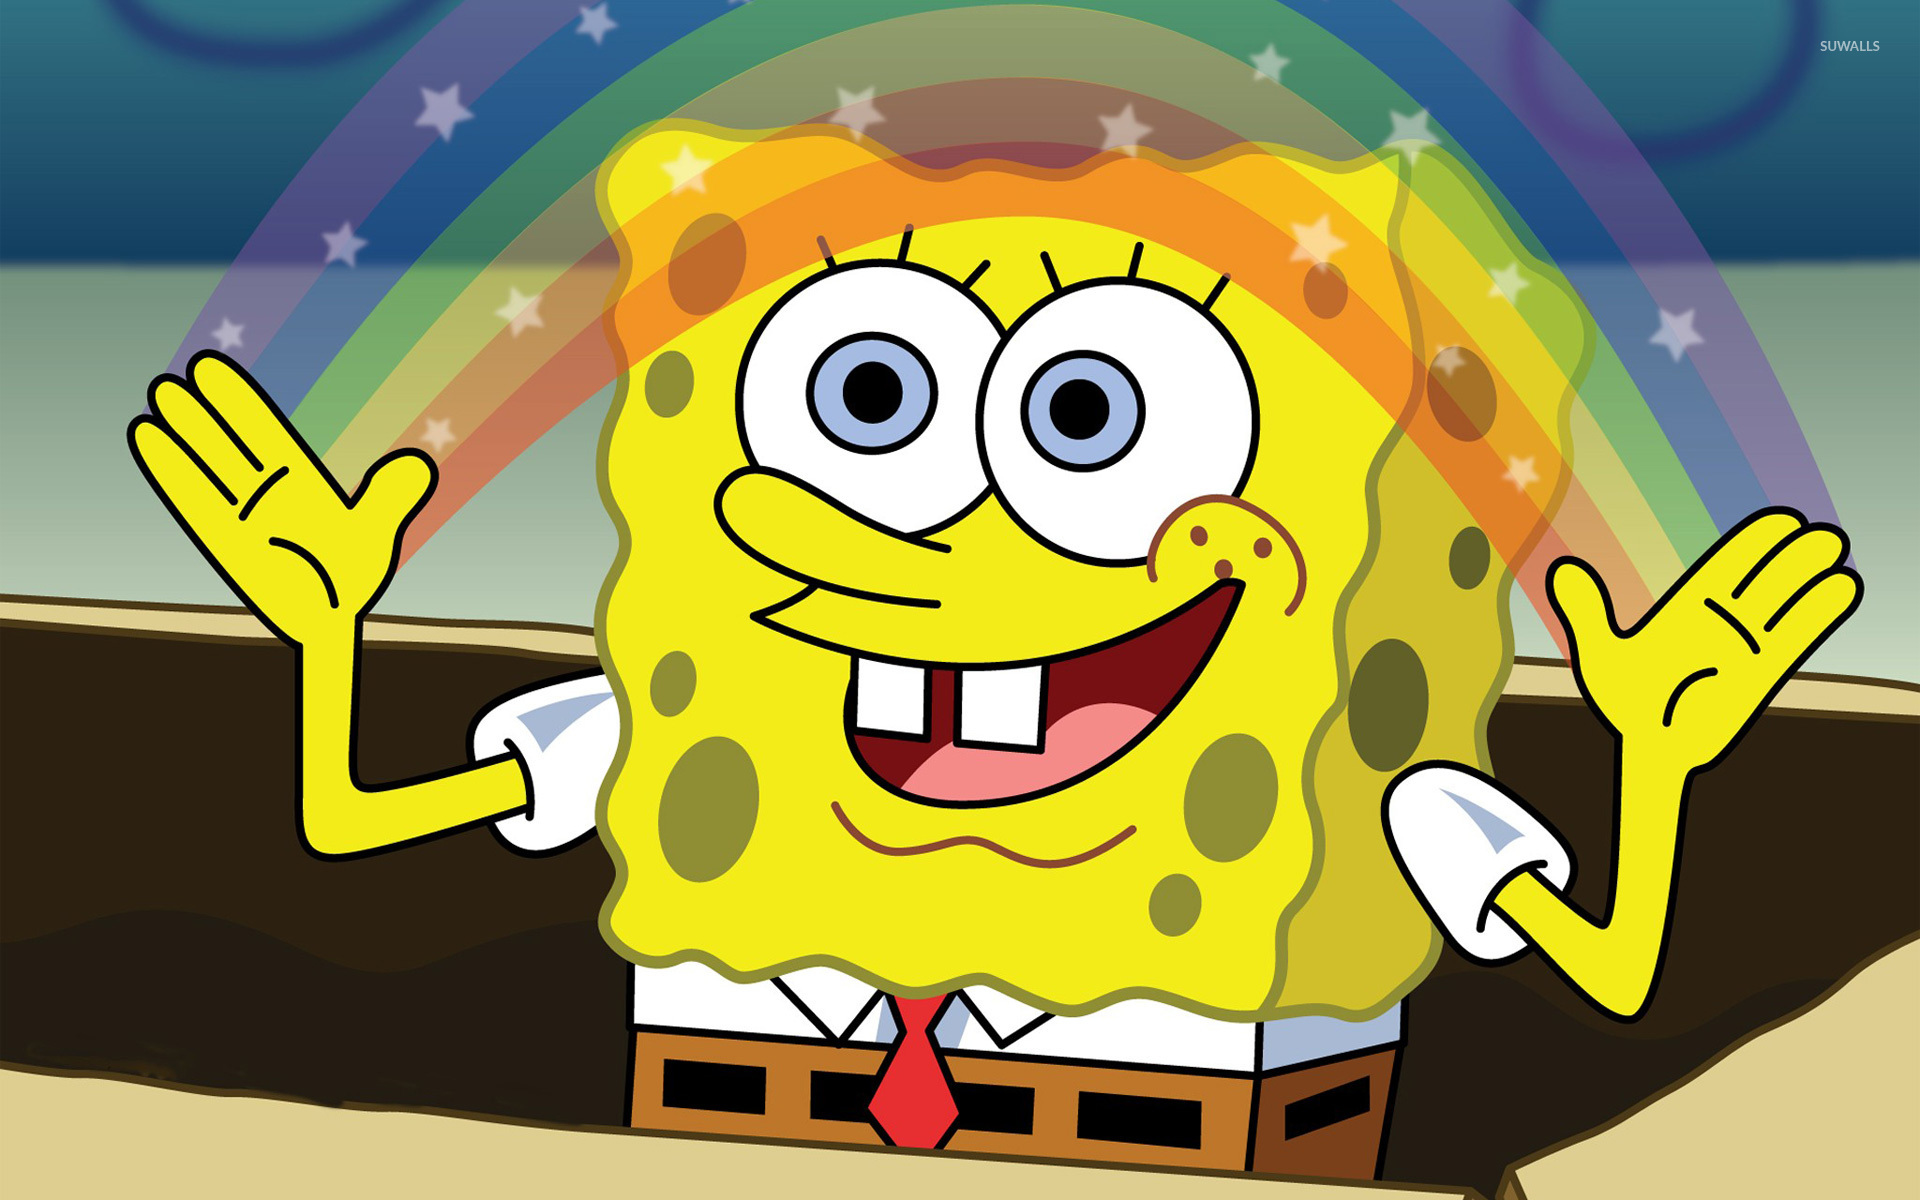 Spongebob Squarepants Wallpaper Cartoon Wallpapers 8855